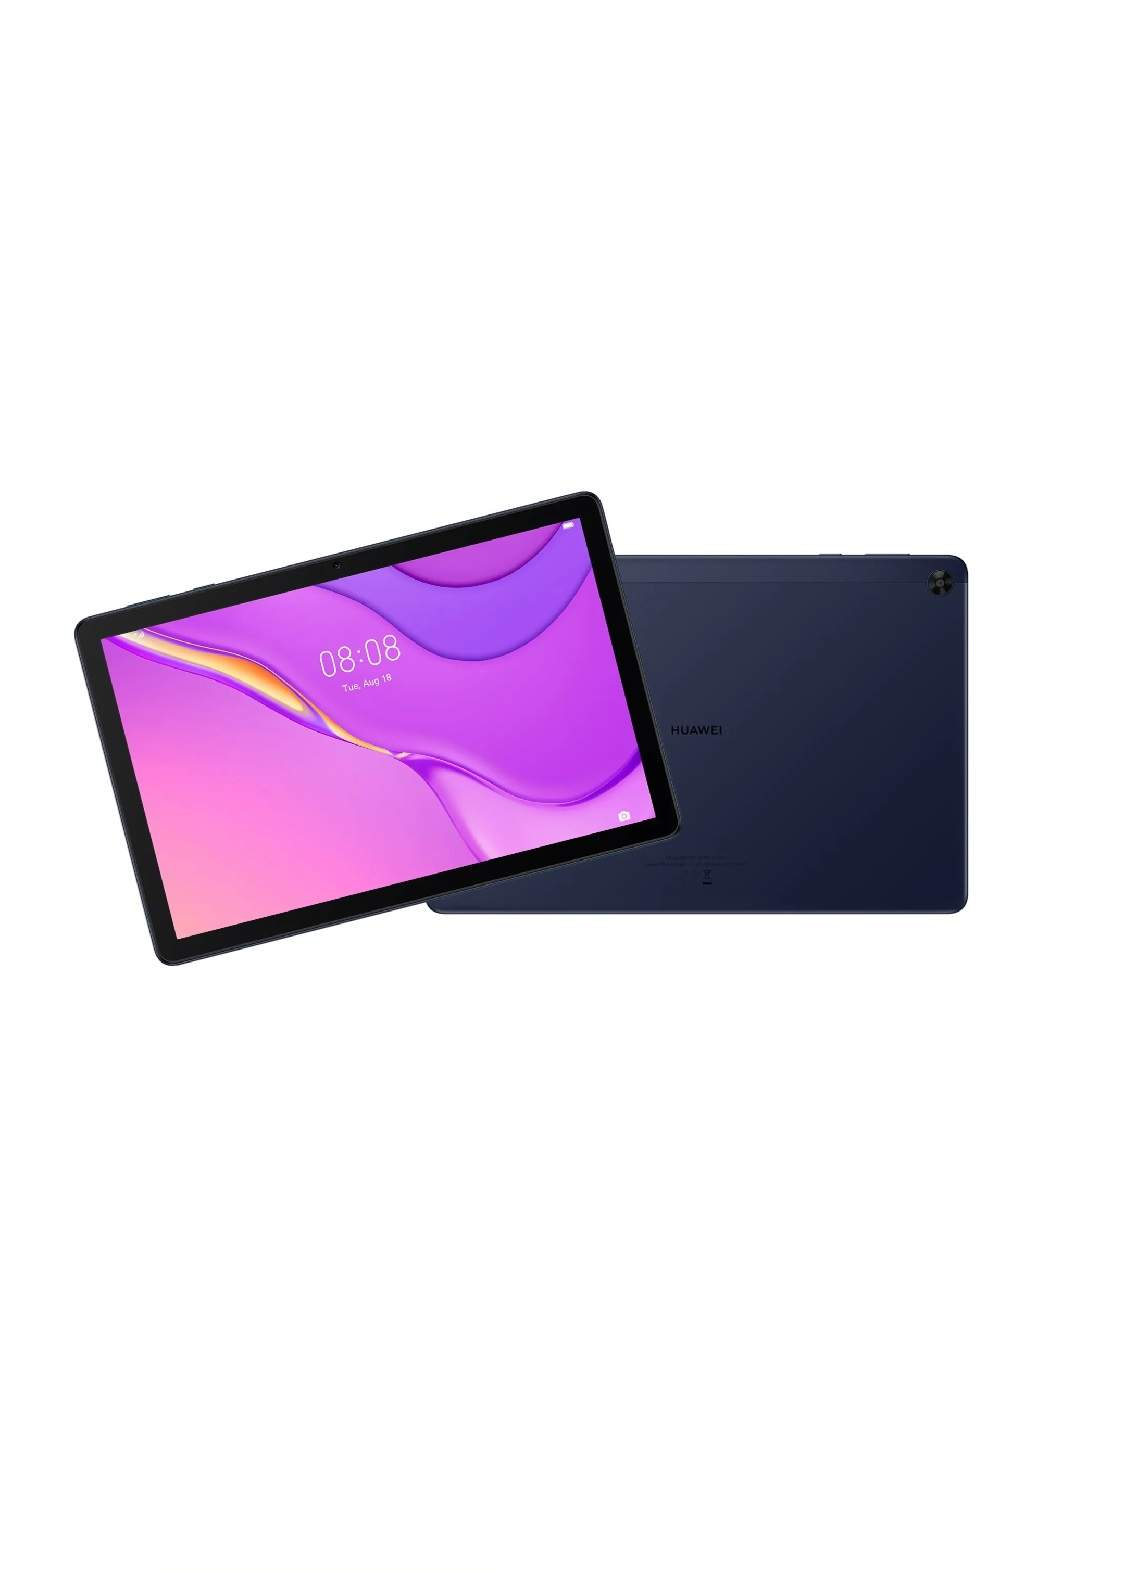 Huawei MatePad T10 16GB - Deepsea Blue